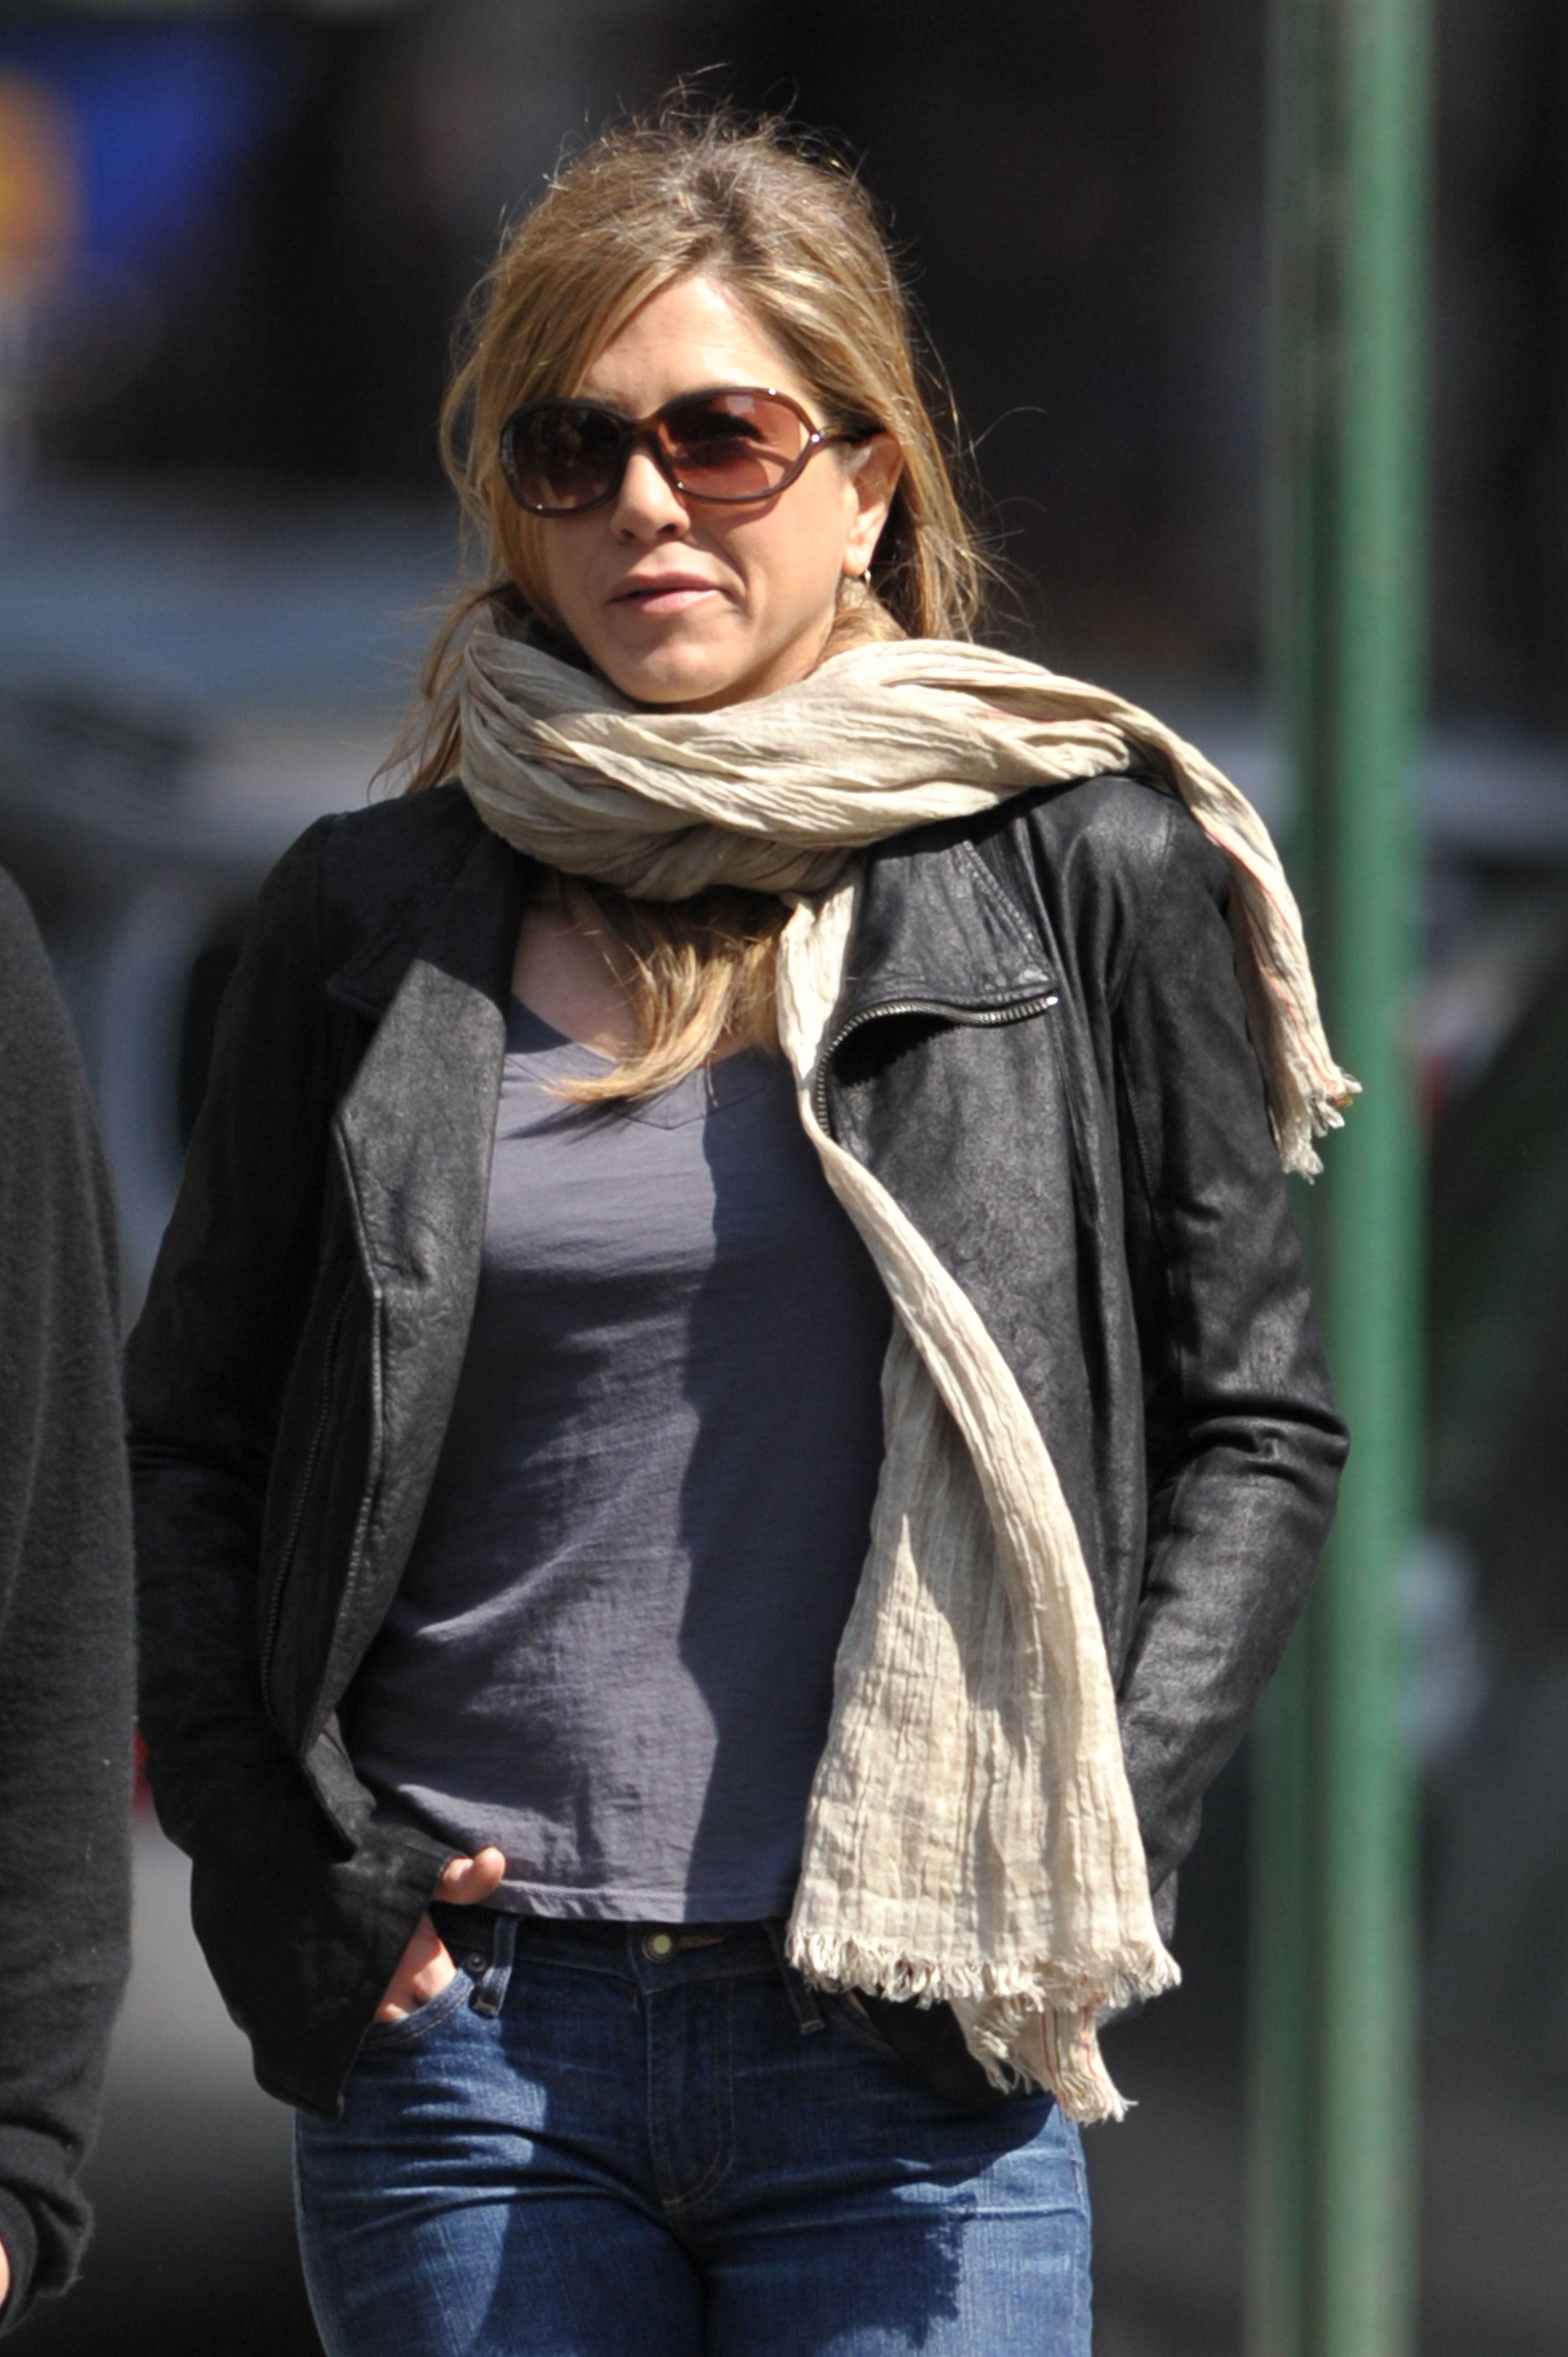 dc488908a7db Jennifer Aniston wearing tom ford sunglasses t